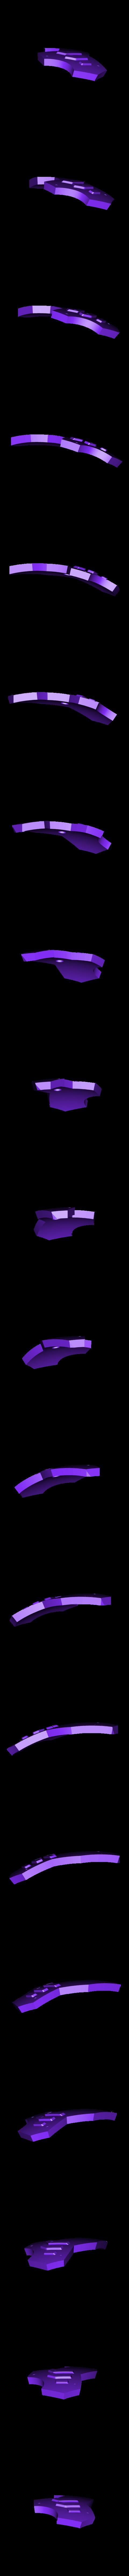 LegShield-LeftBack.stl Download STL file Hammond's Wrecking Ball Mech from Overwatch • 3D printer template, FunbieStudios